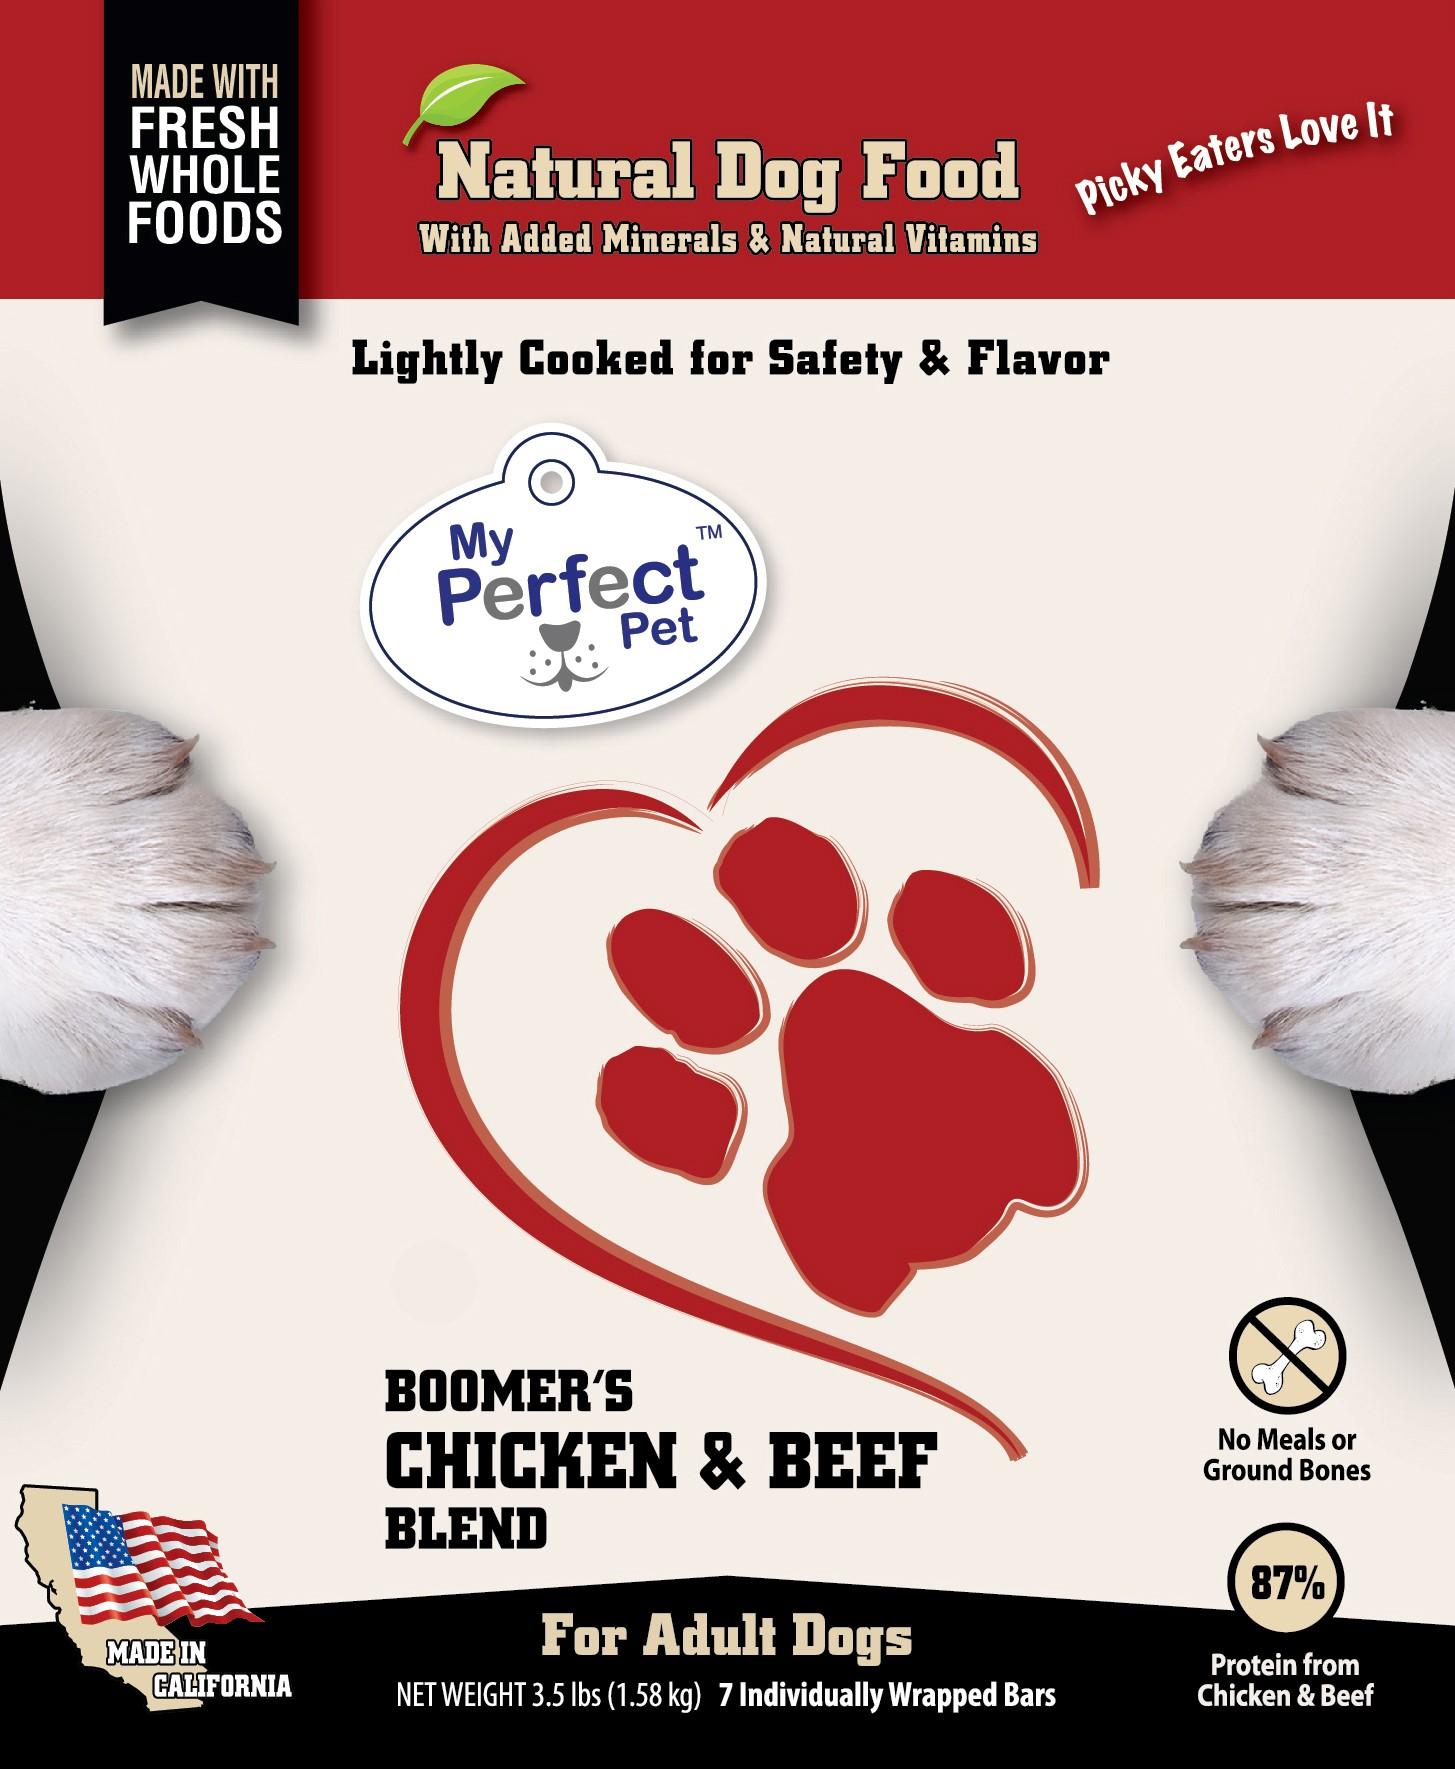 My Perfect Pet Boomer's Blend Chicken & Beef Frozen Dog Food 3.5lbs